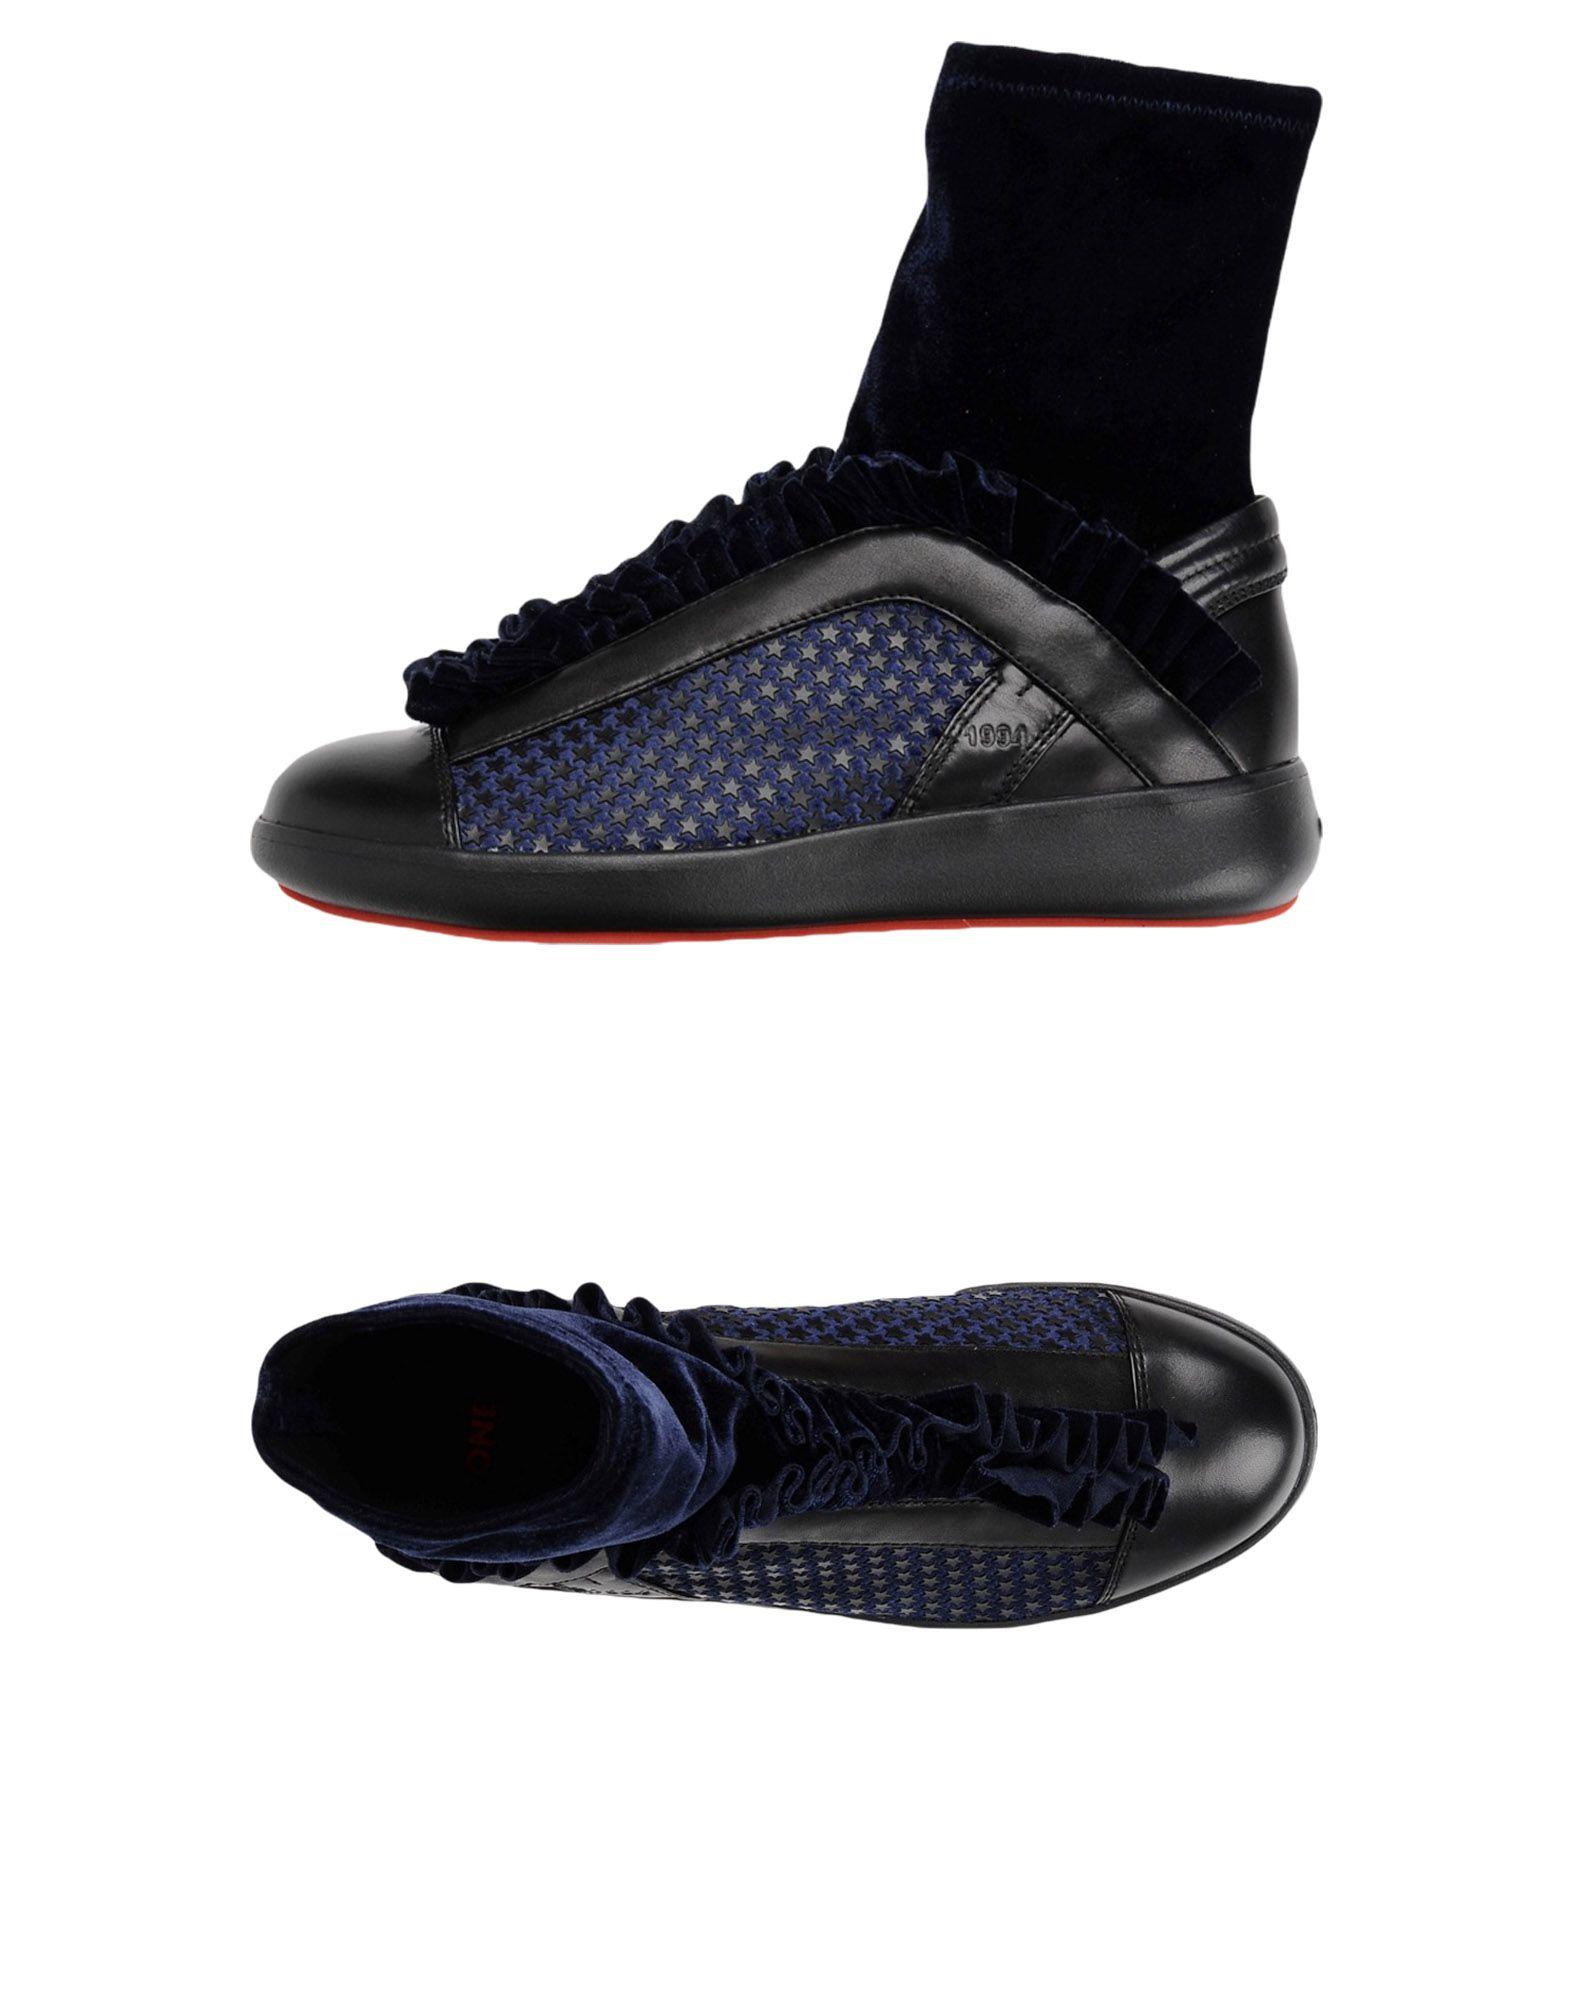 CLONE Высокие кеды и кроссовки кеды кроссовки высокие dc council mid tx stone camo